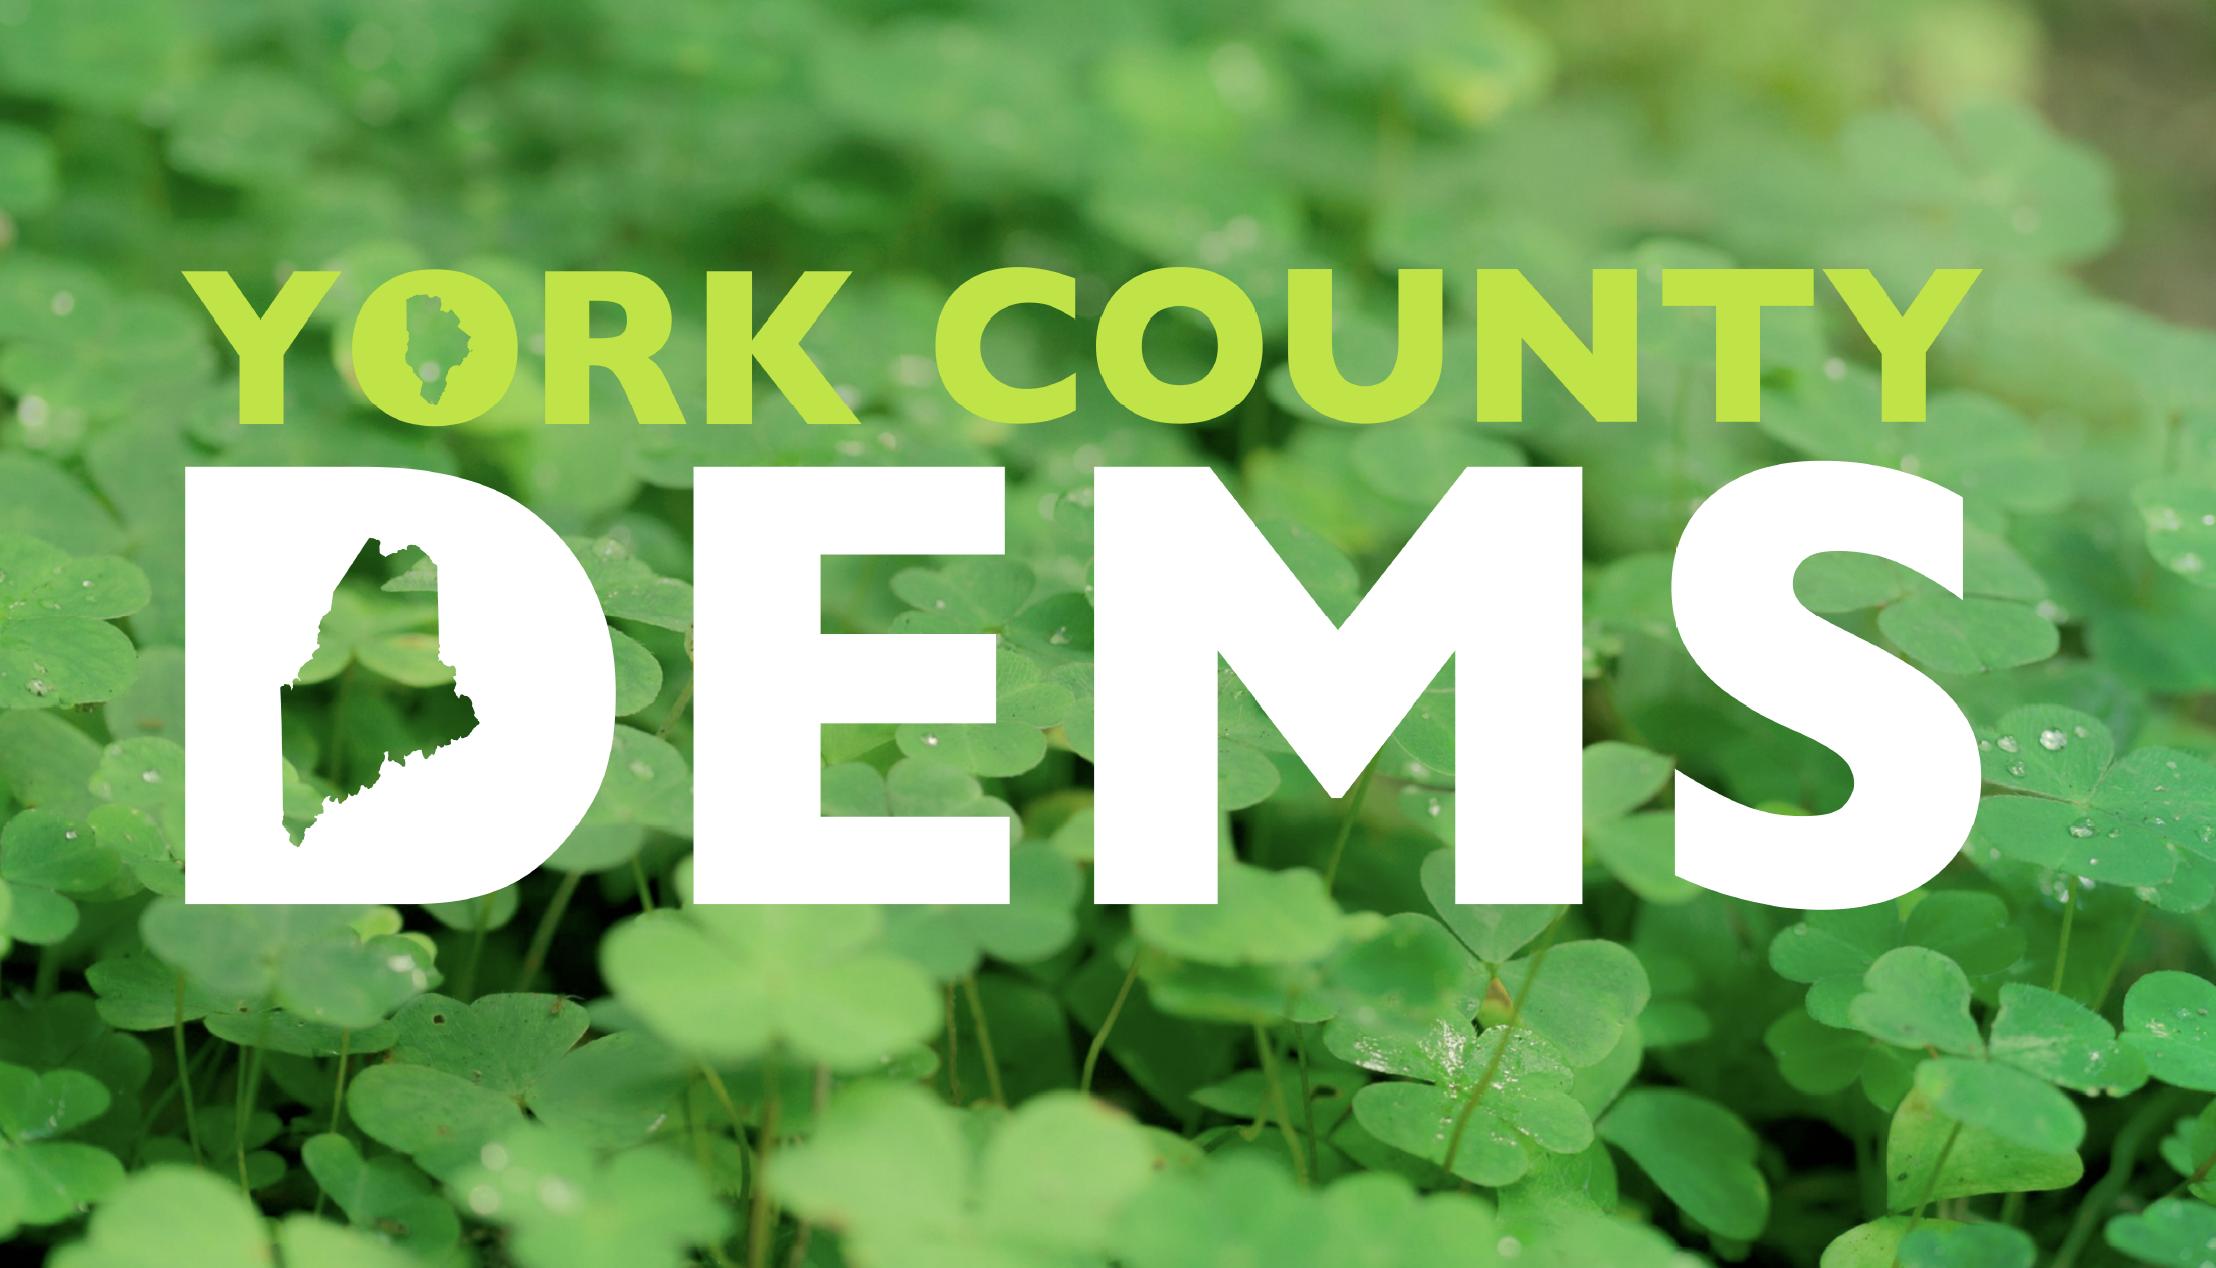 York County Democratic Committee (ME)